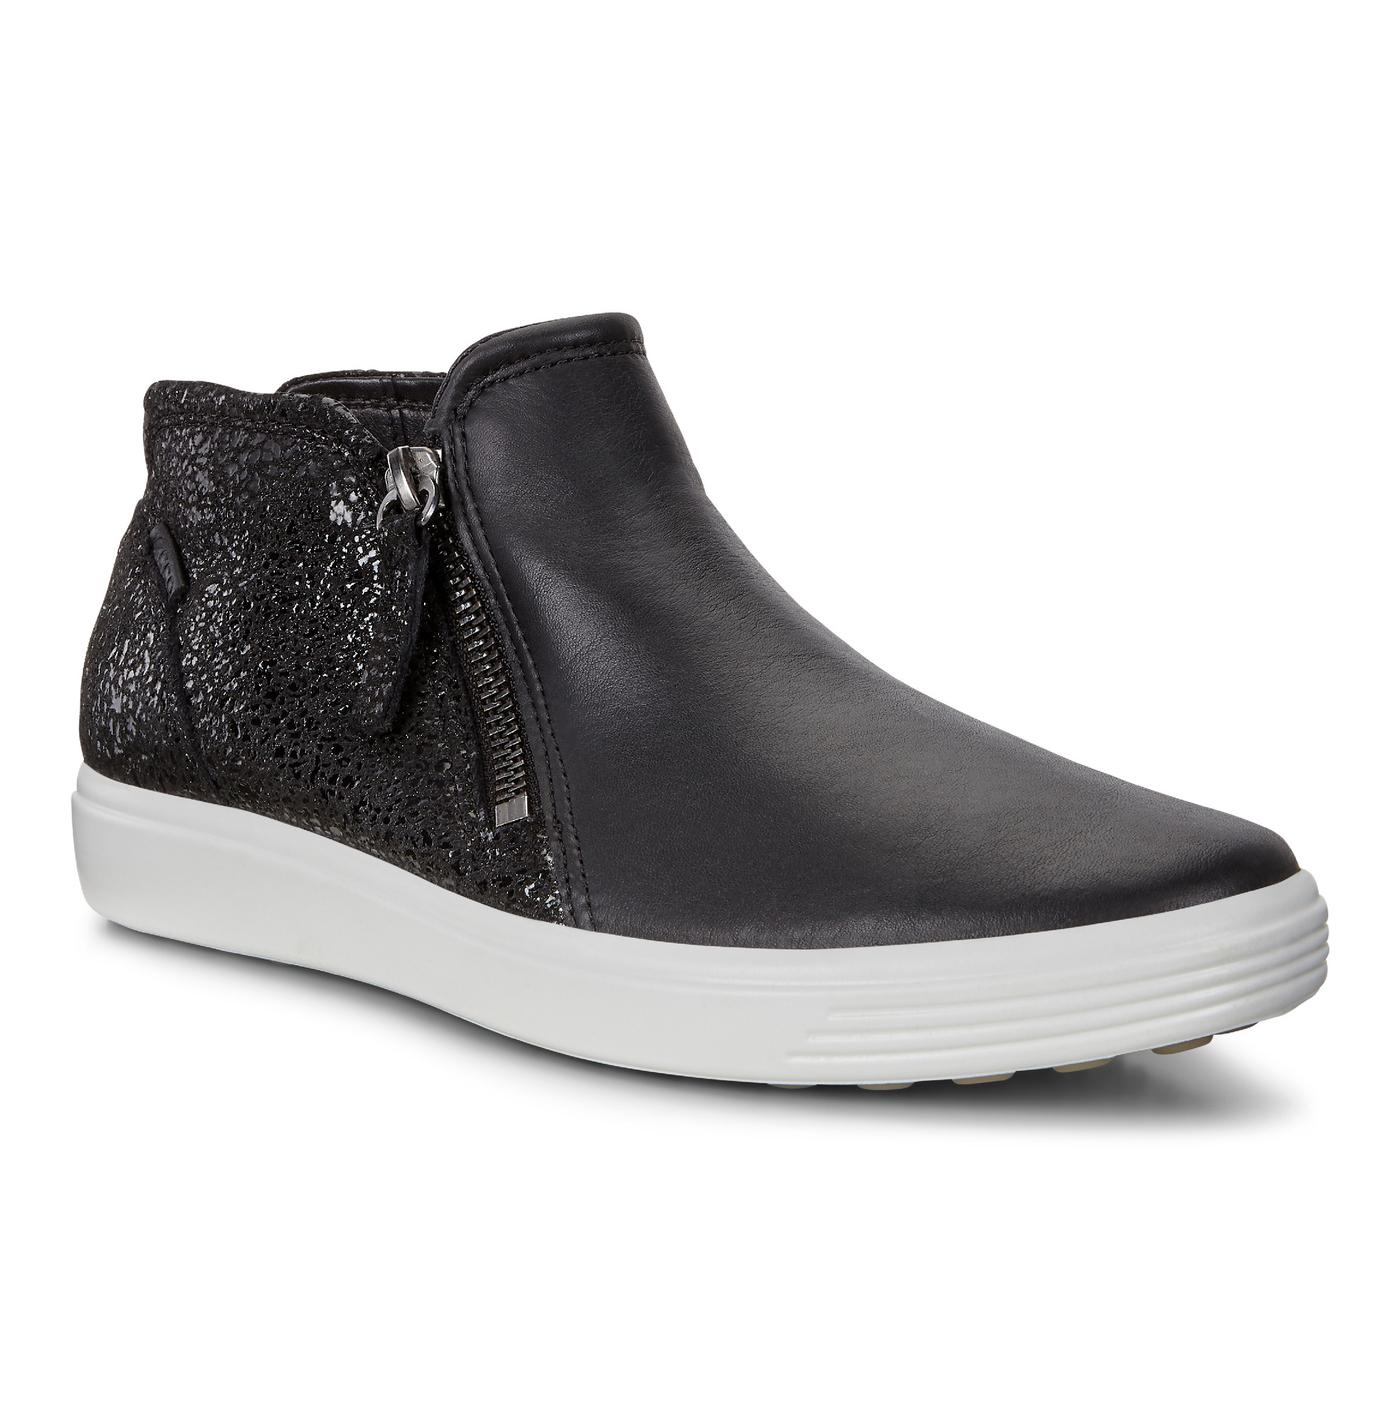 76cdba3082 ECCO Women's Soft 7 Low Bootie Black Leather